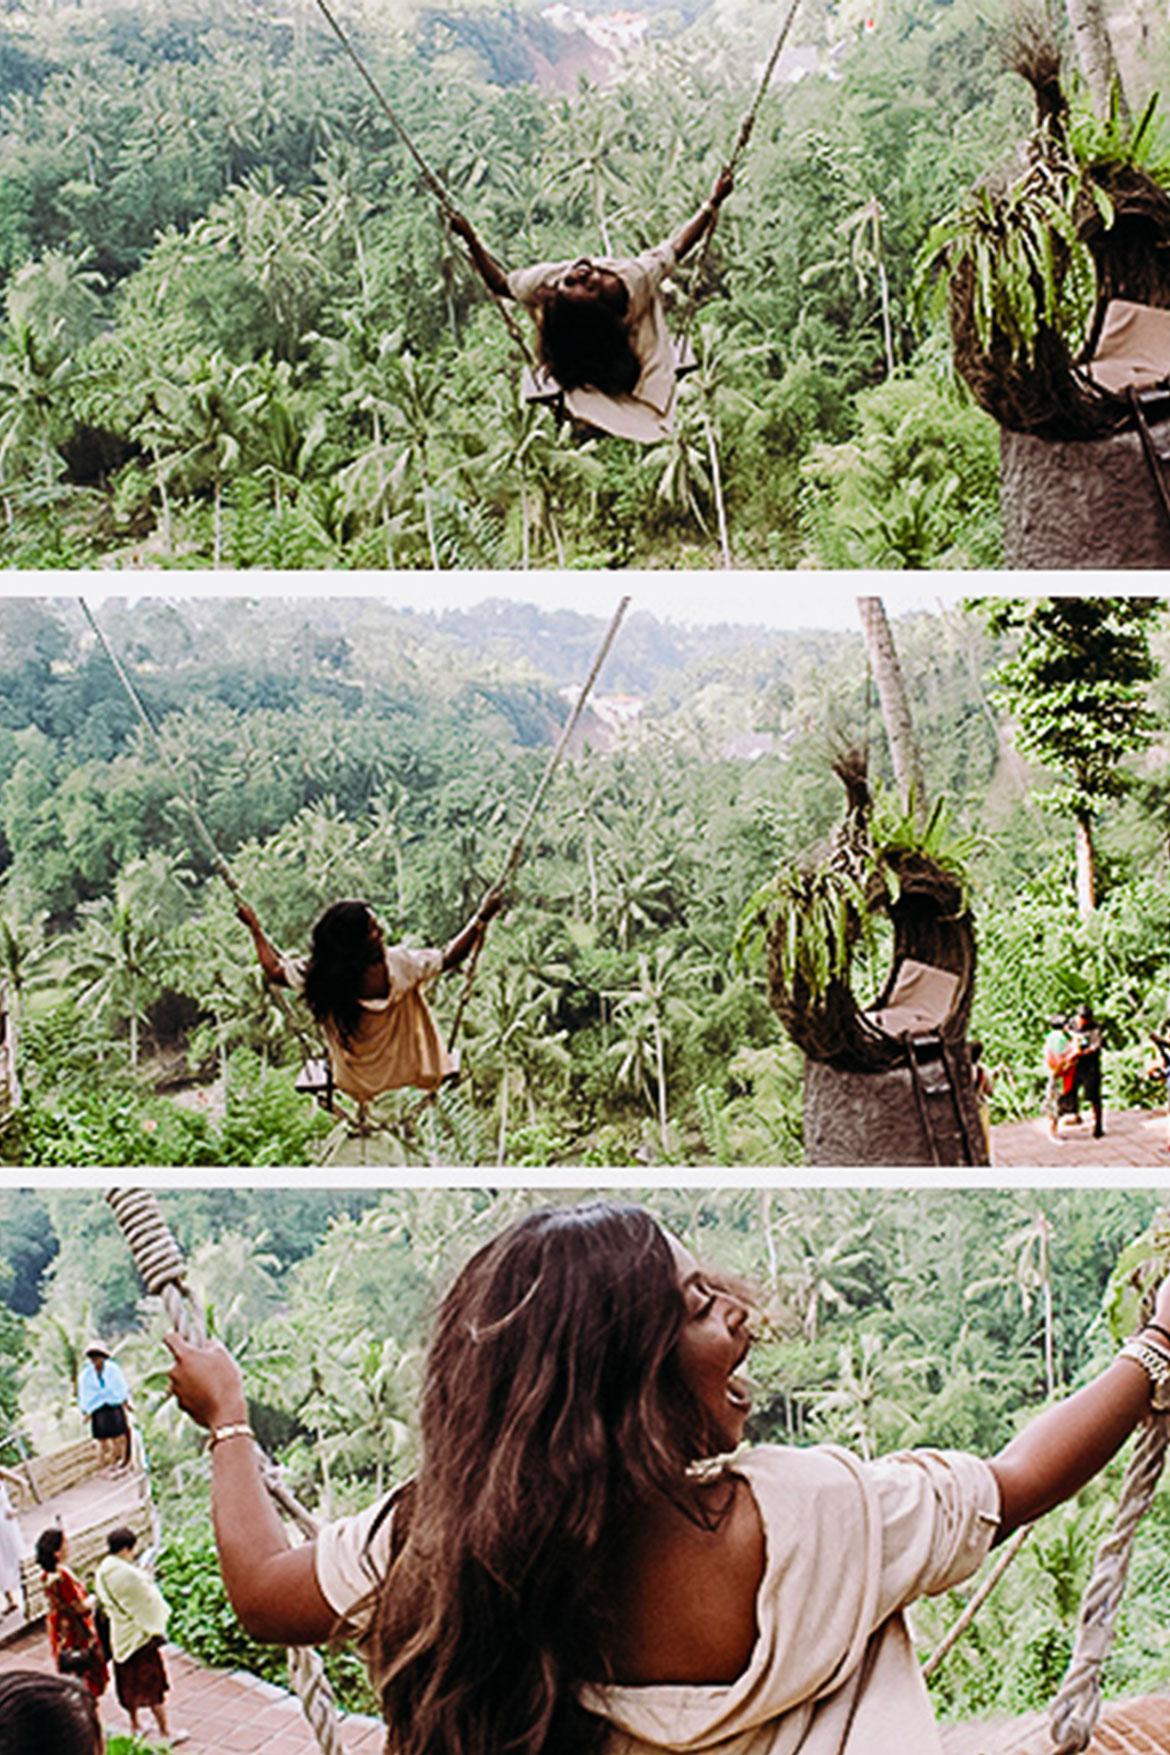 Karis-renee-Ubud-Bali-swing